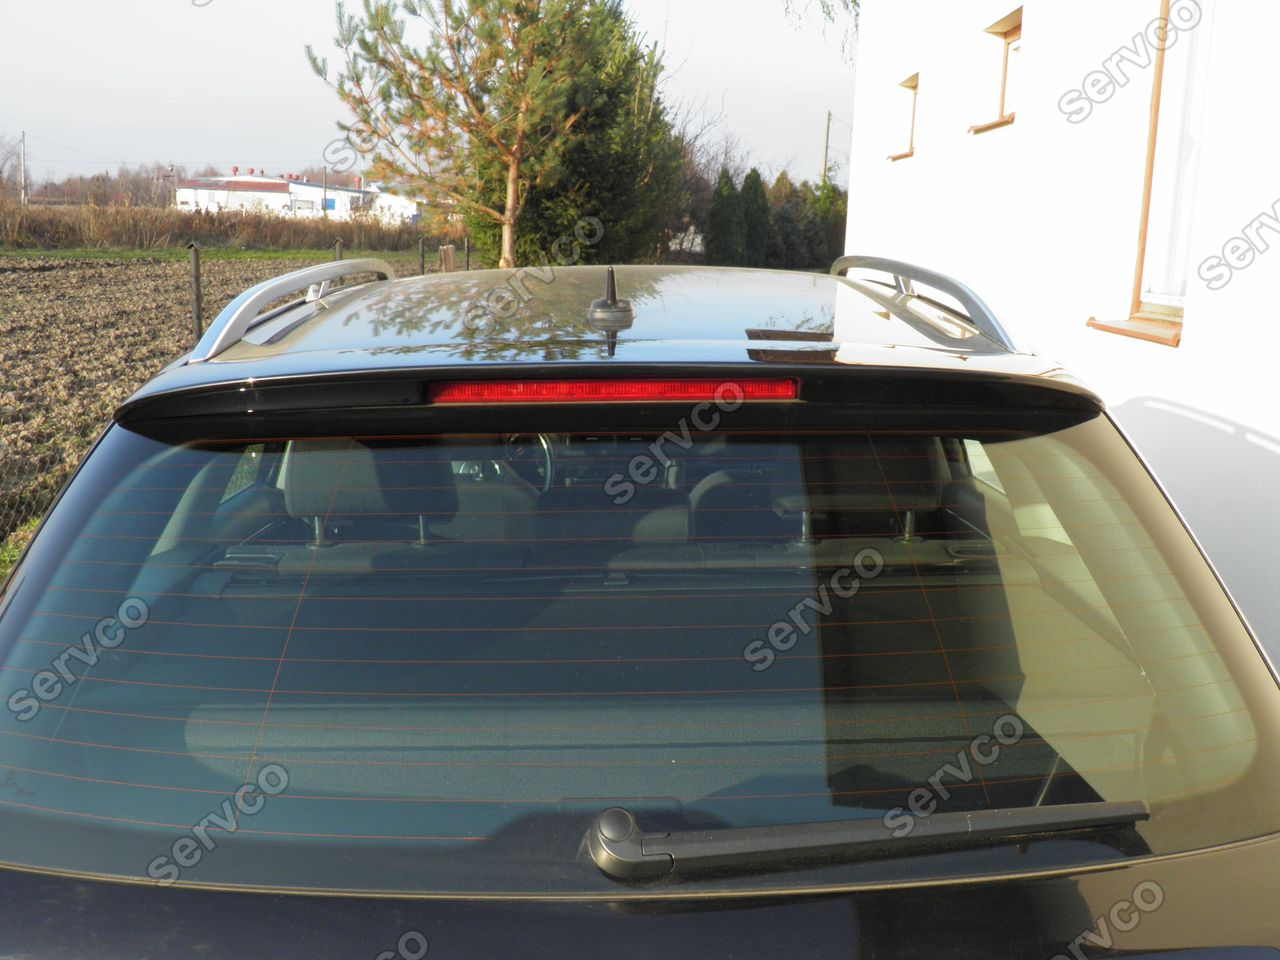 Eleron Audi A4 B6 B7 S4 RS4 S line Avant Kombi Combi Break Caravan 8E 8H ver1